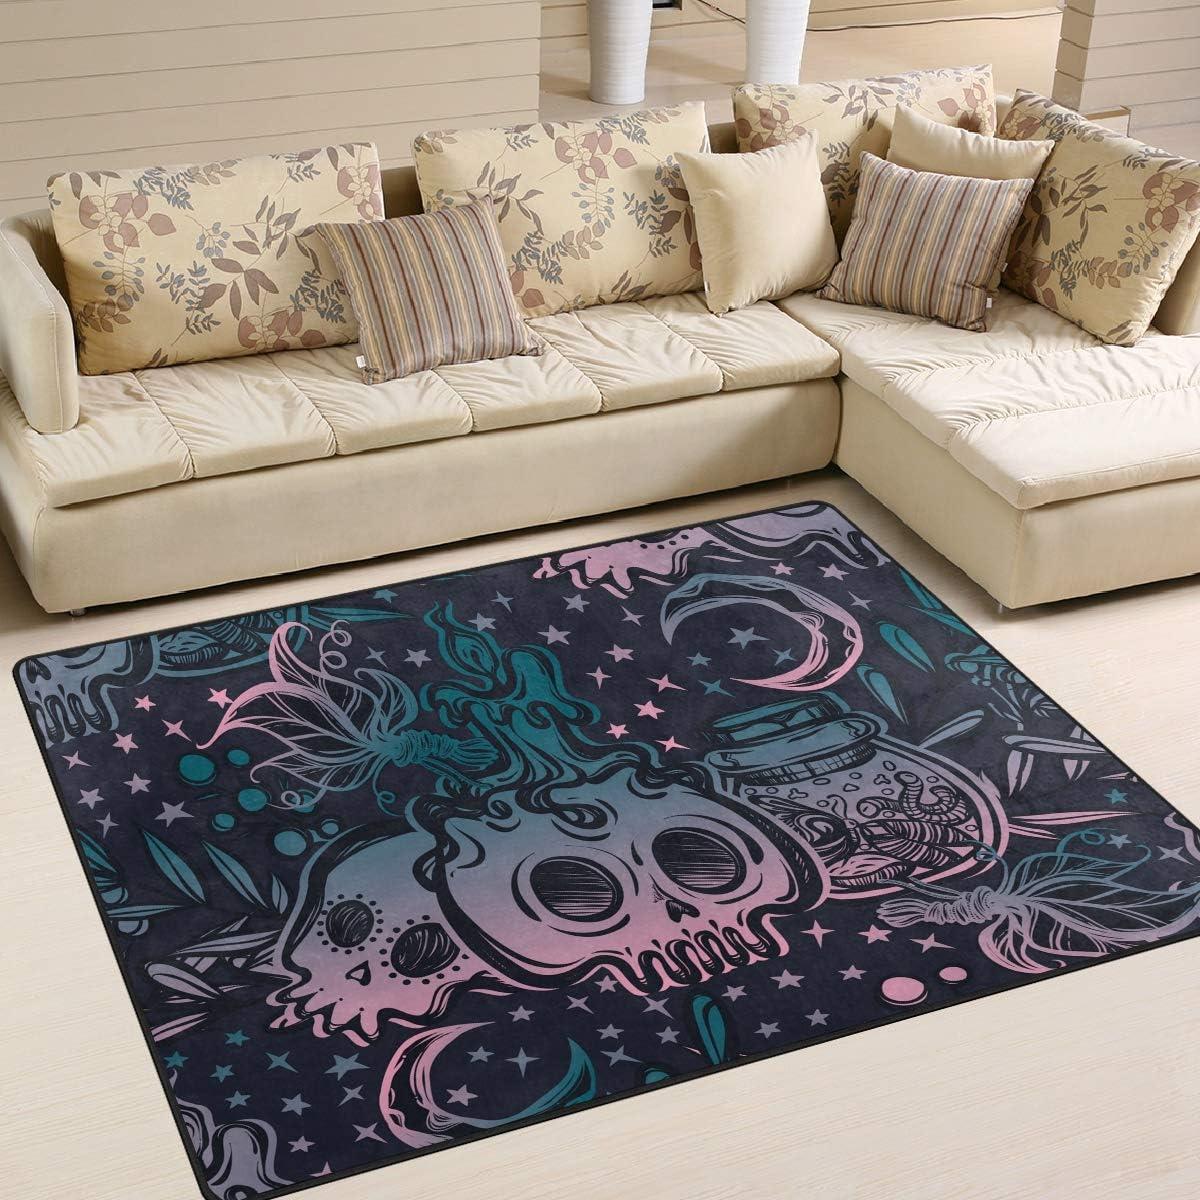 Mr.Lucien Area Rug for Bedroom メーカー公式 Purple Skuull Decor Gothic 流行のアイテム Indoor